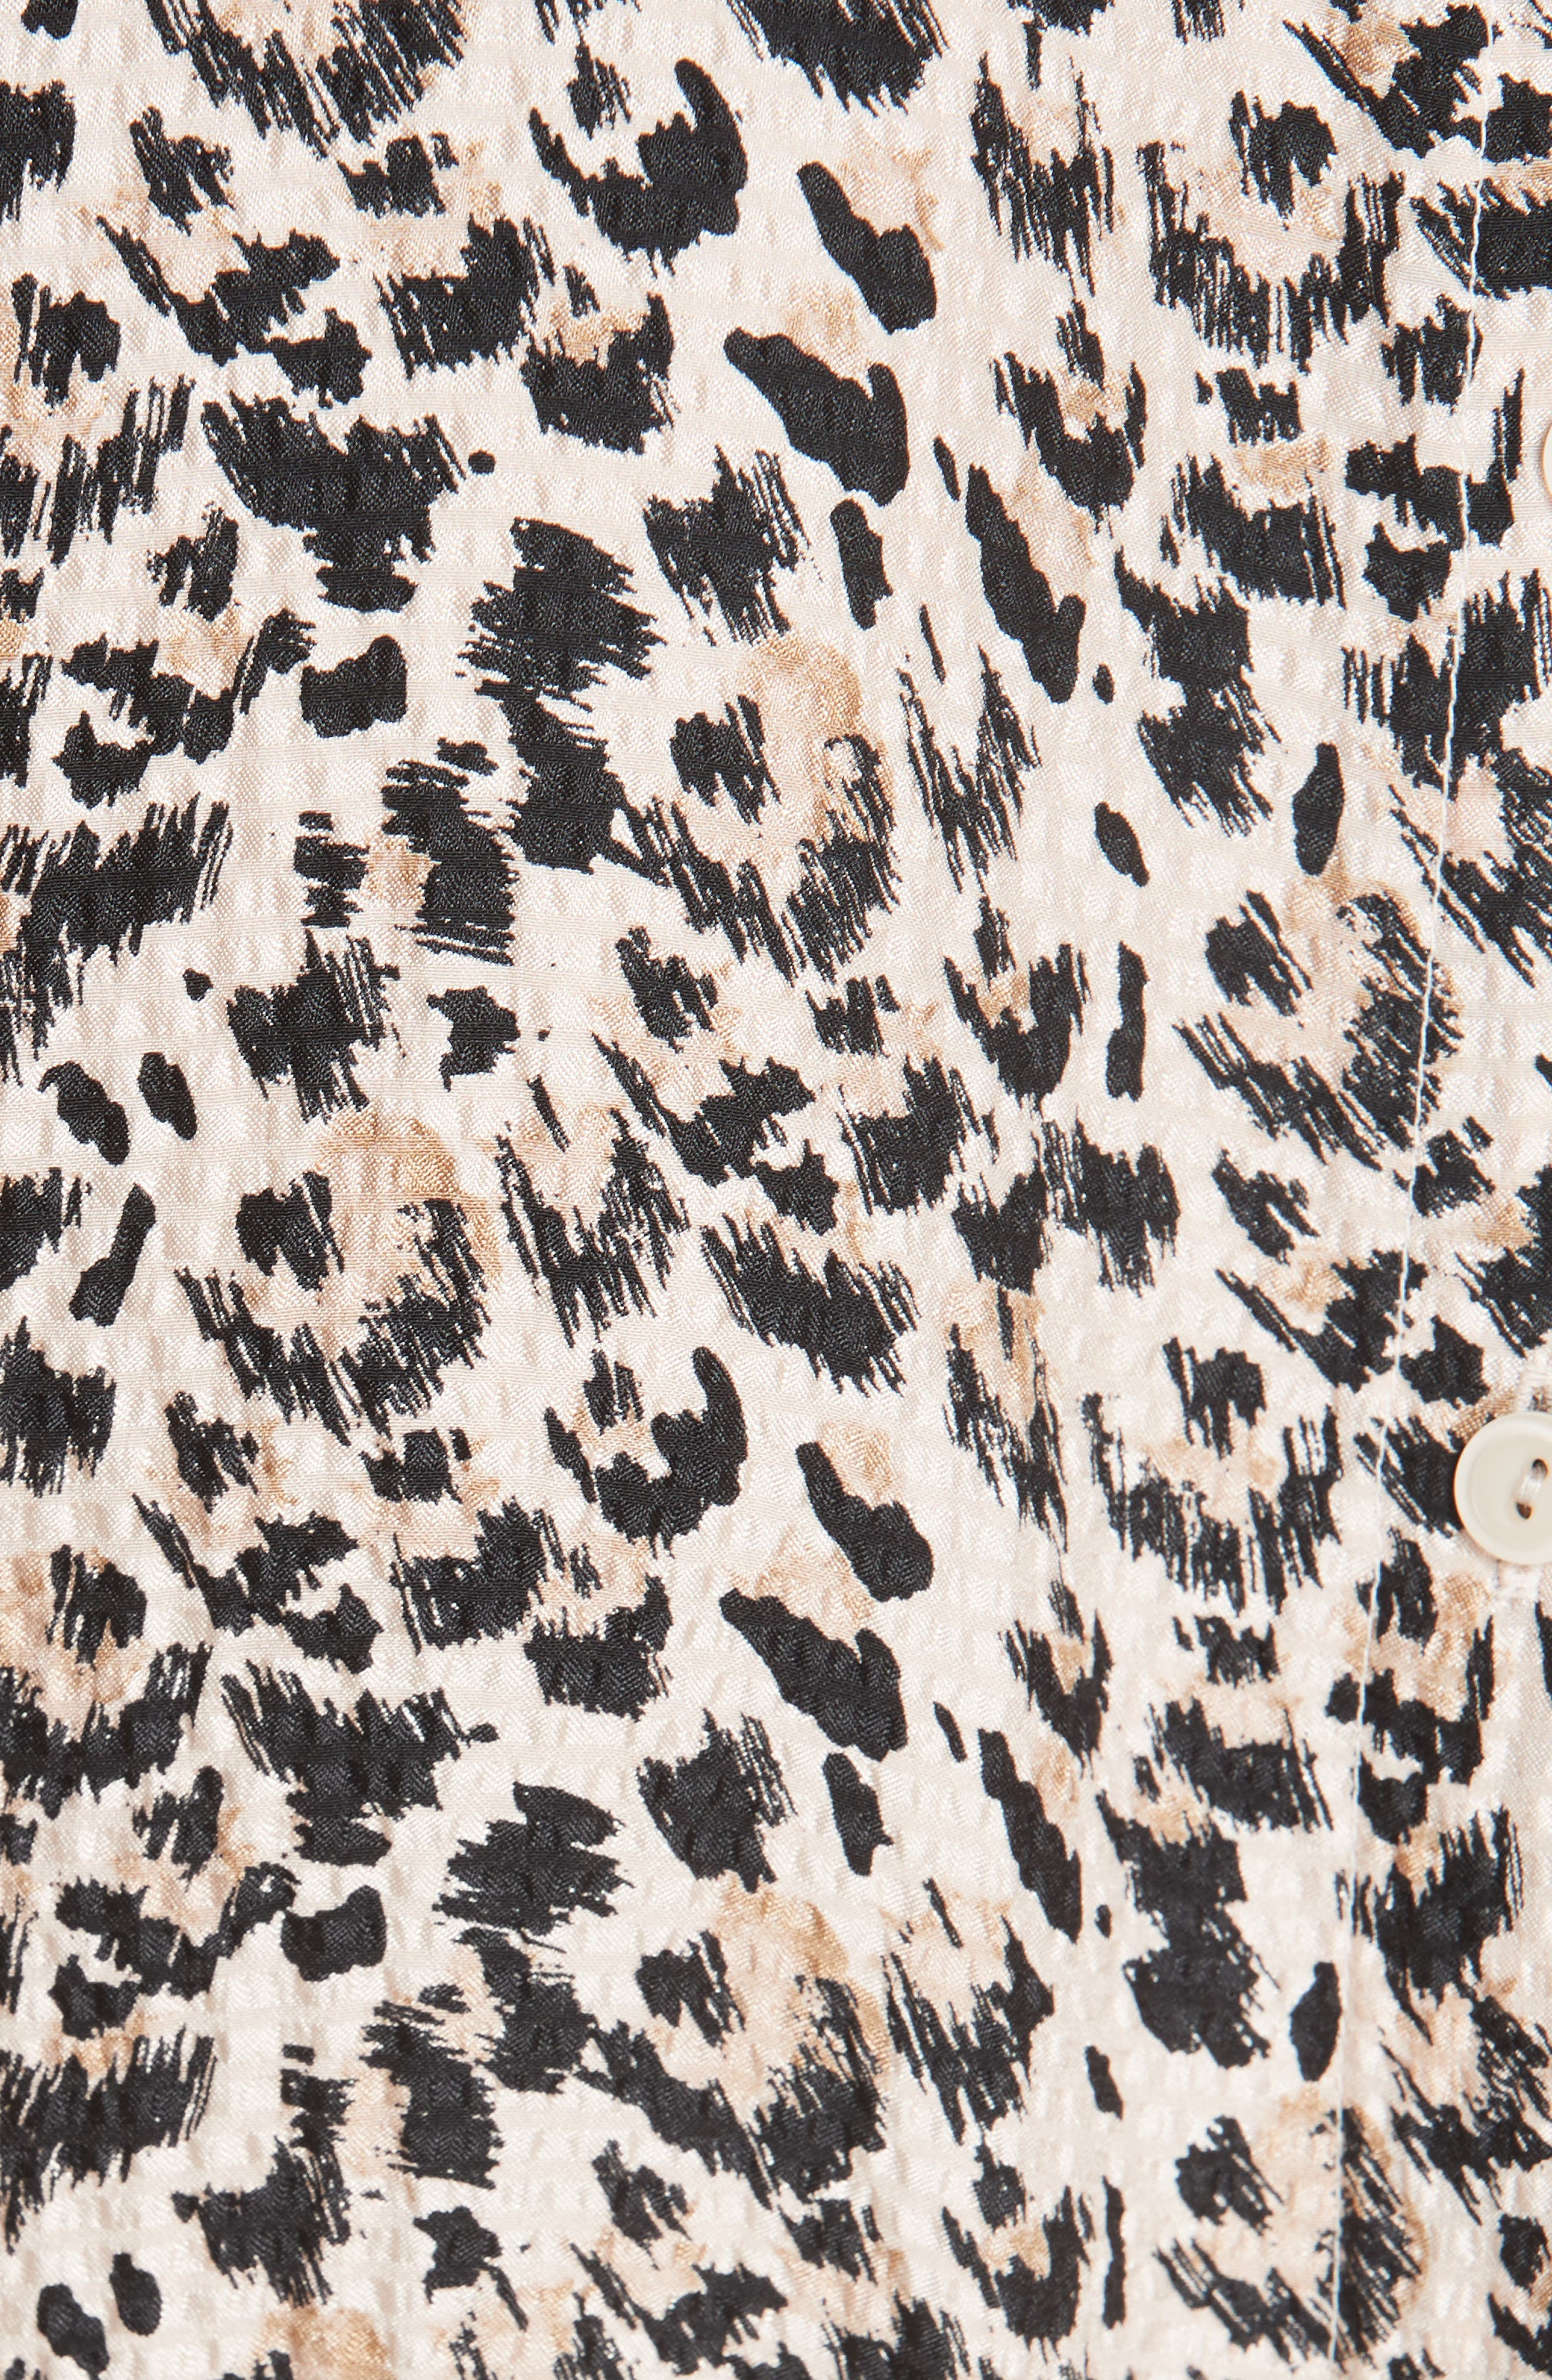 Leopard Print Silk Dress,                             Alternate thumbnail 6, color,                             CARAMEL COMBO